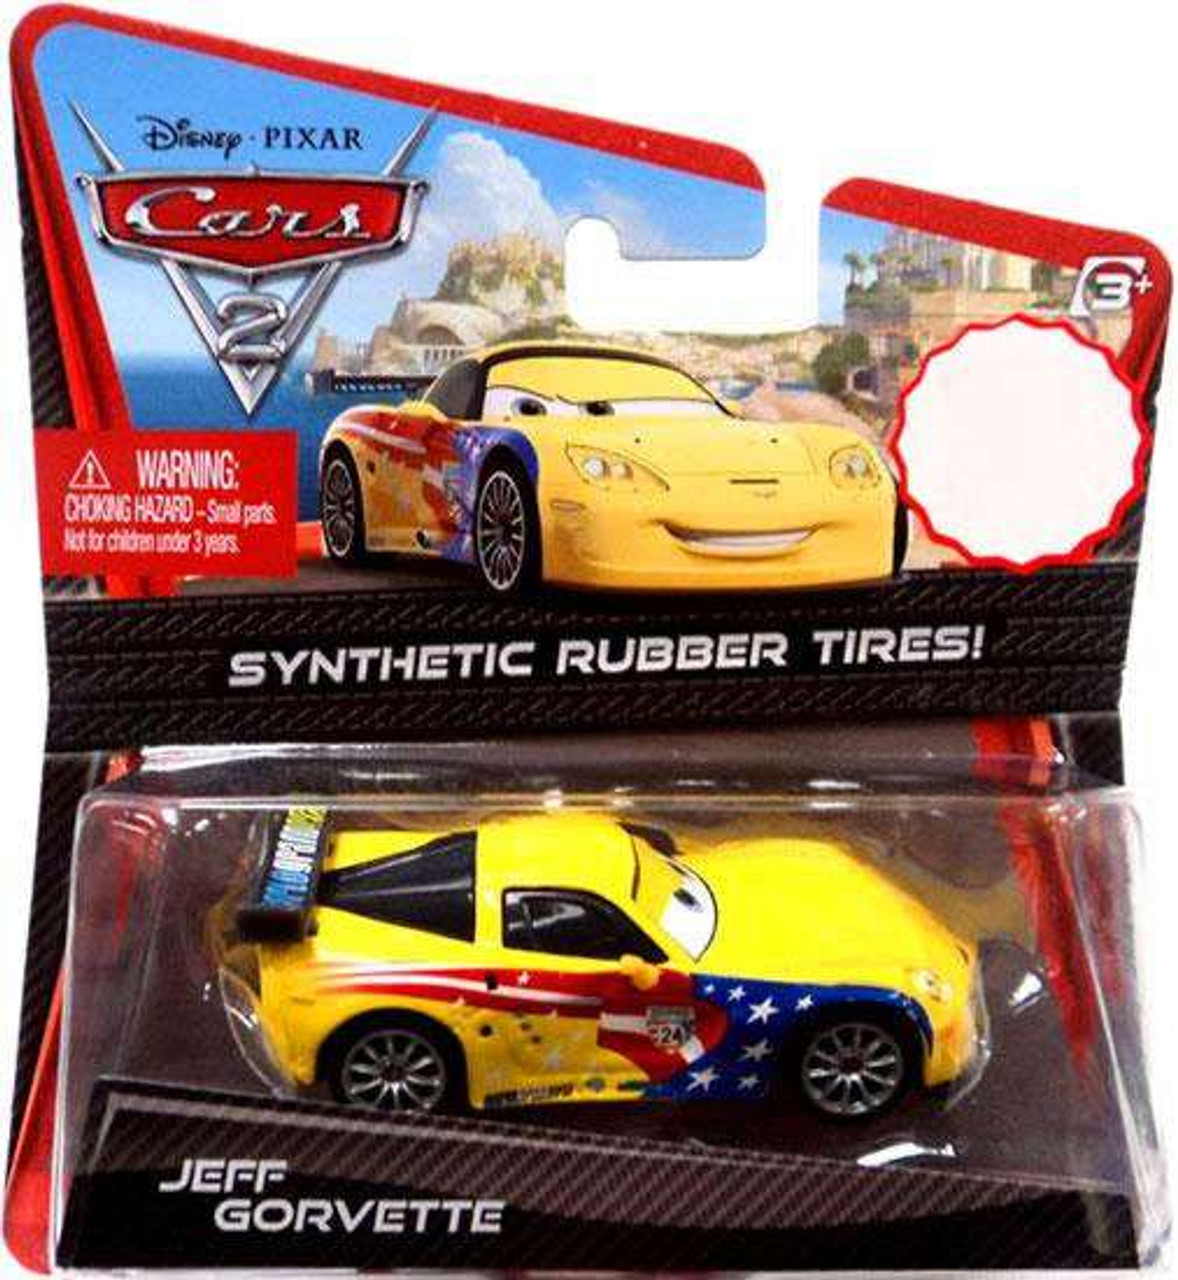 Disney Pixar Cars Cars 2 Synthetic Rubber Tires Jeff Gorvette